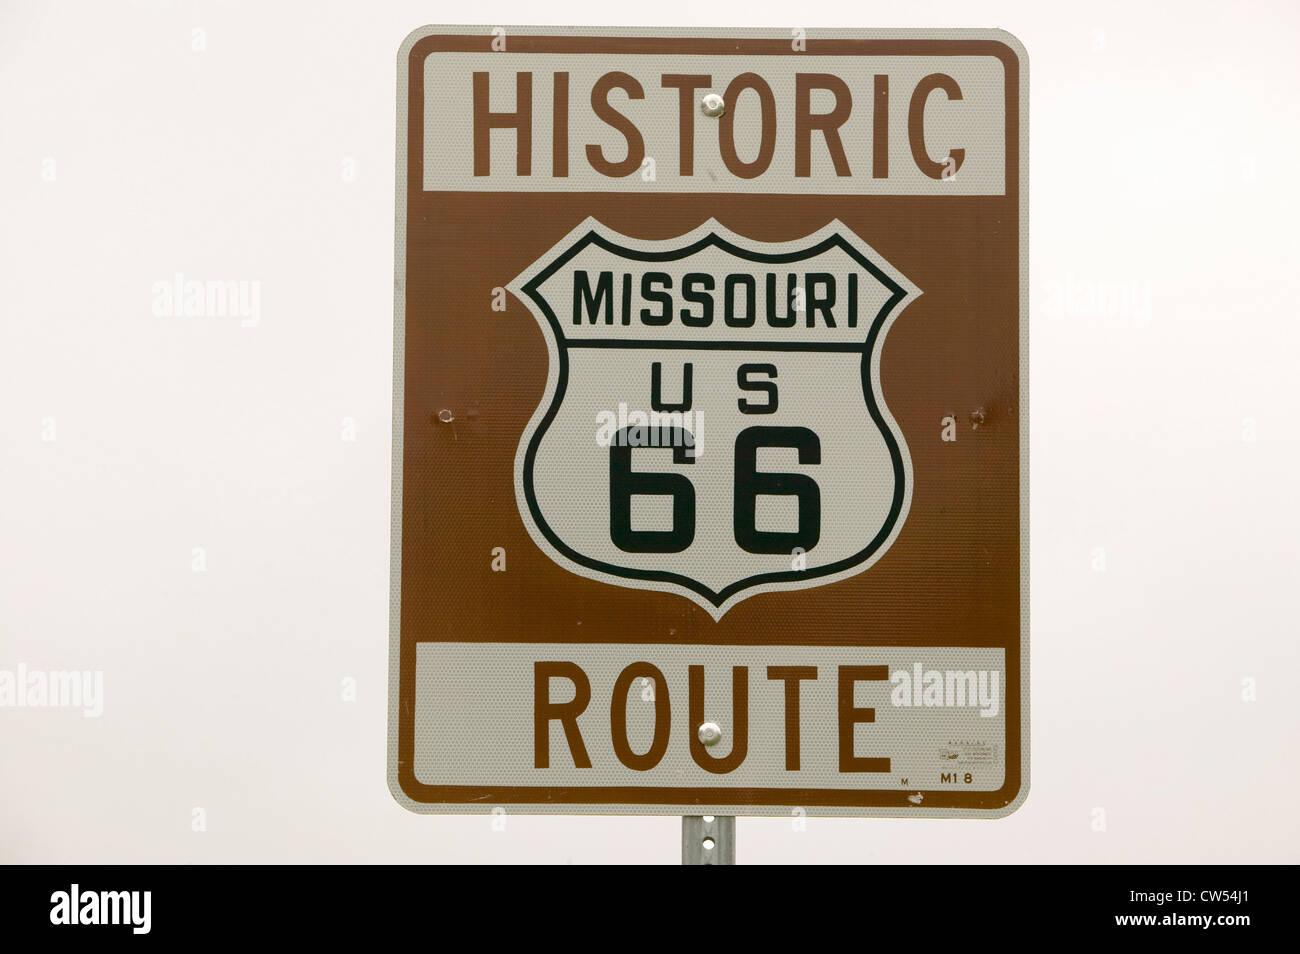 44 Missouri Stock Photos & 44 Missouri Stock Images - Alamy